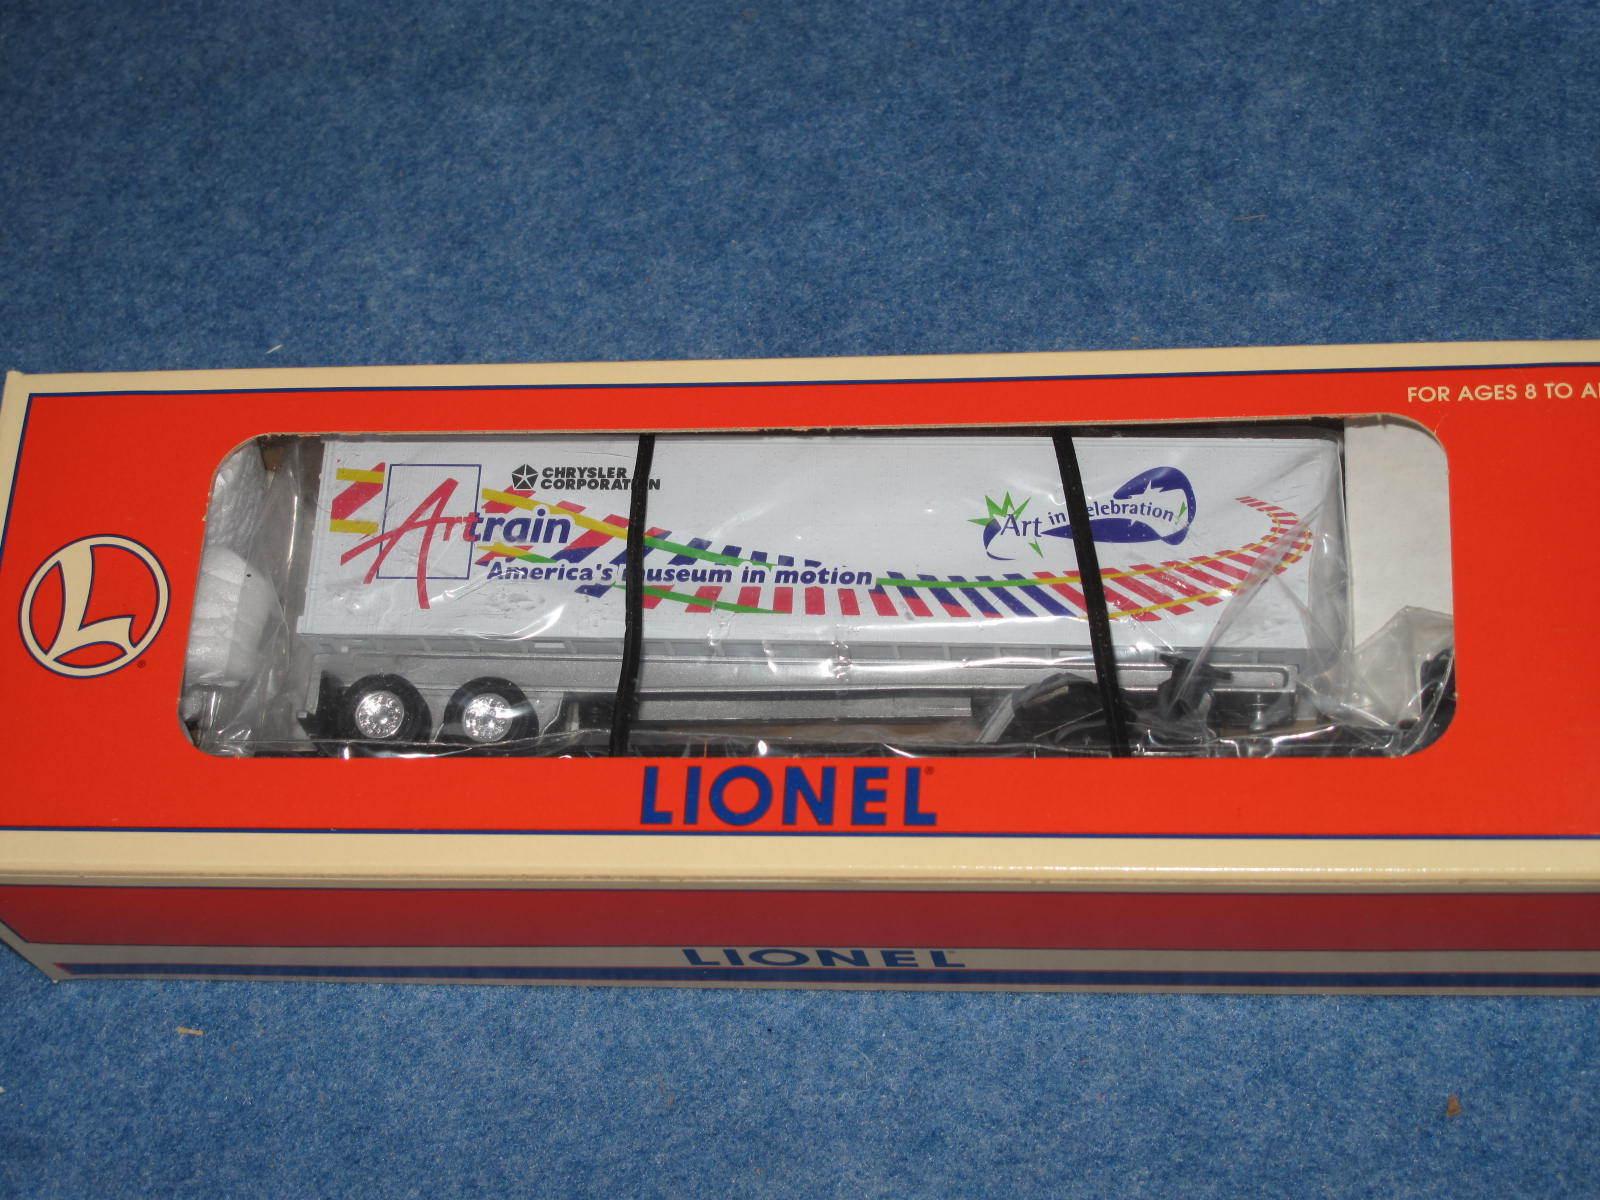 1997 Lionel 6-19425 Artrain CSX Flatcar with Trailer Chrysler Corp Nuovo L2271